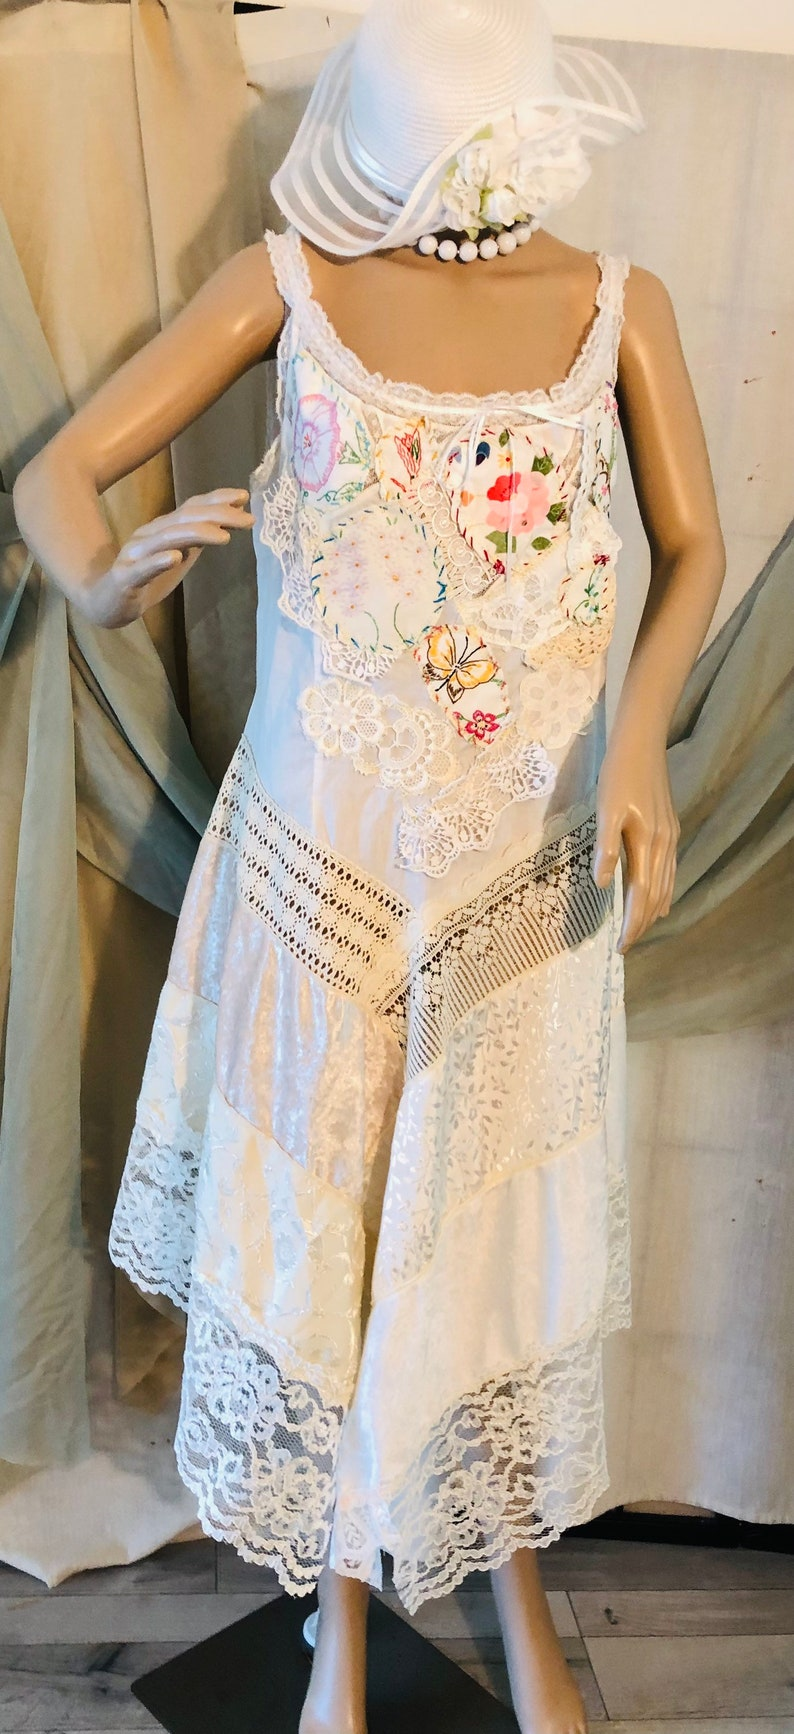 LXL white  Baroque Victorian romantic crochet patchwork needlework embroidered beach  wedding gown magnolia prairie asymmetrical dress.